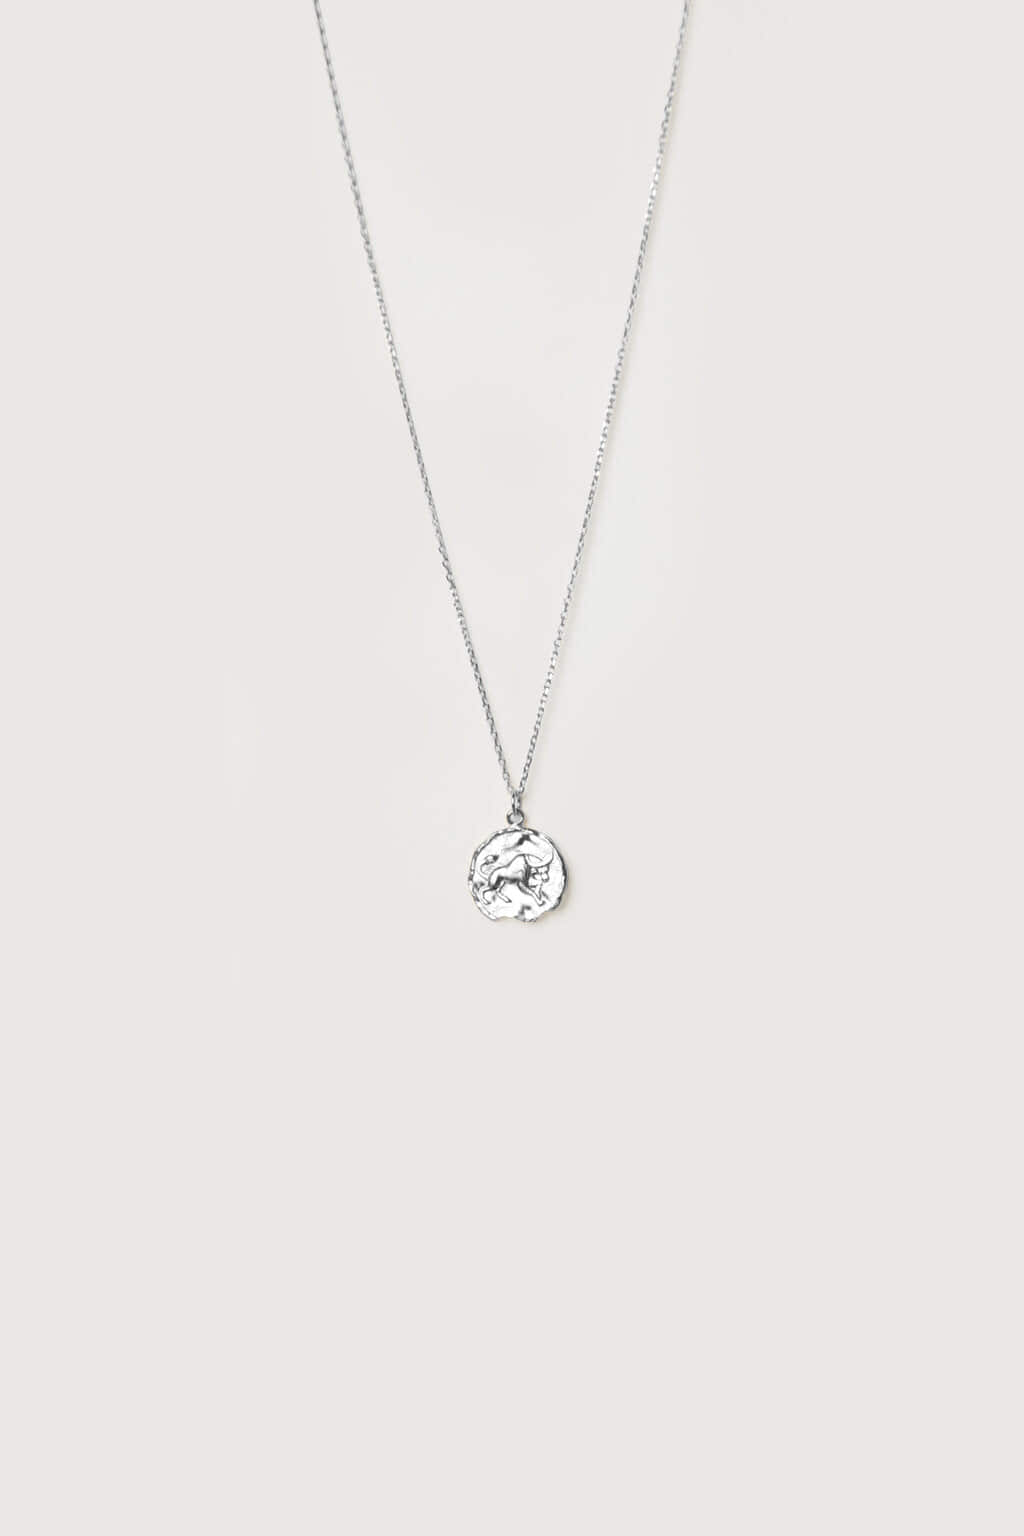 Necklace K006 Silver 3